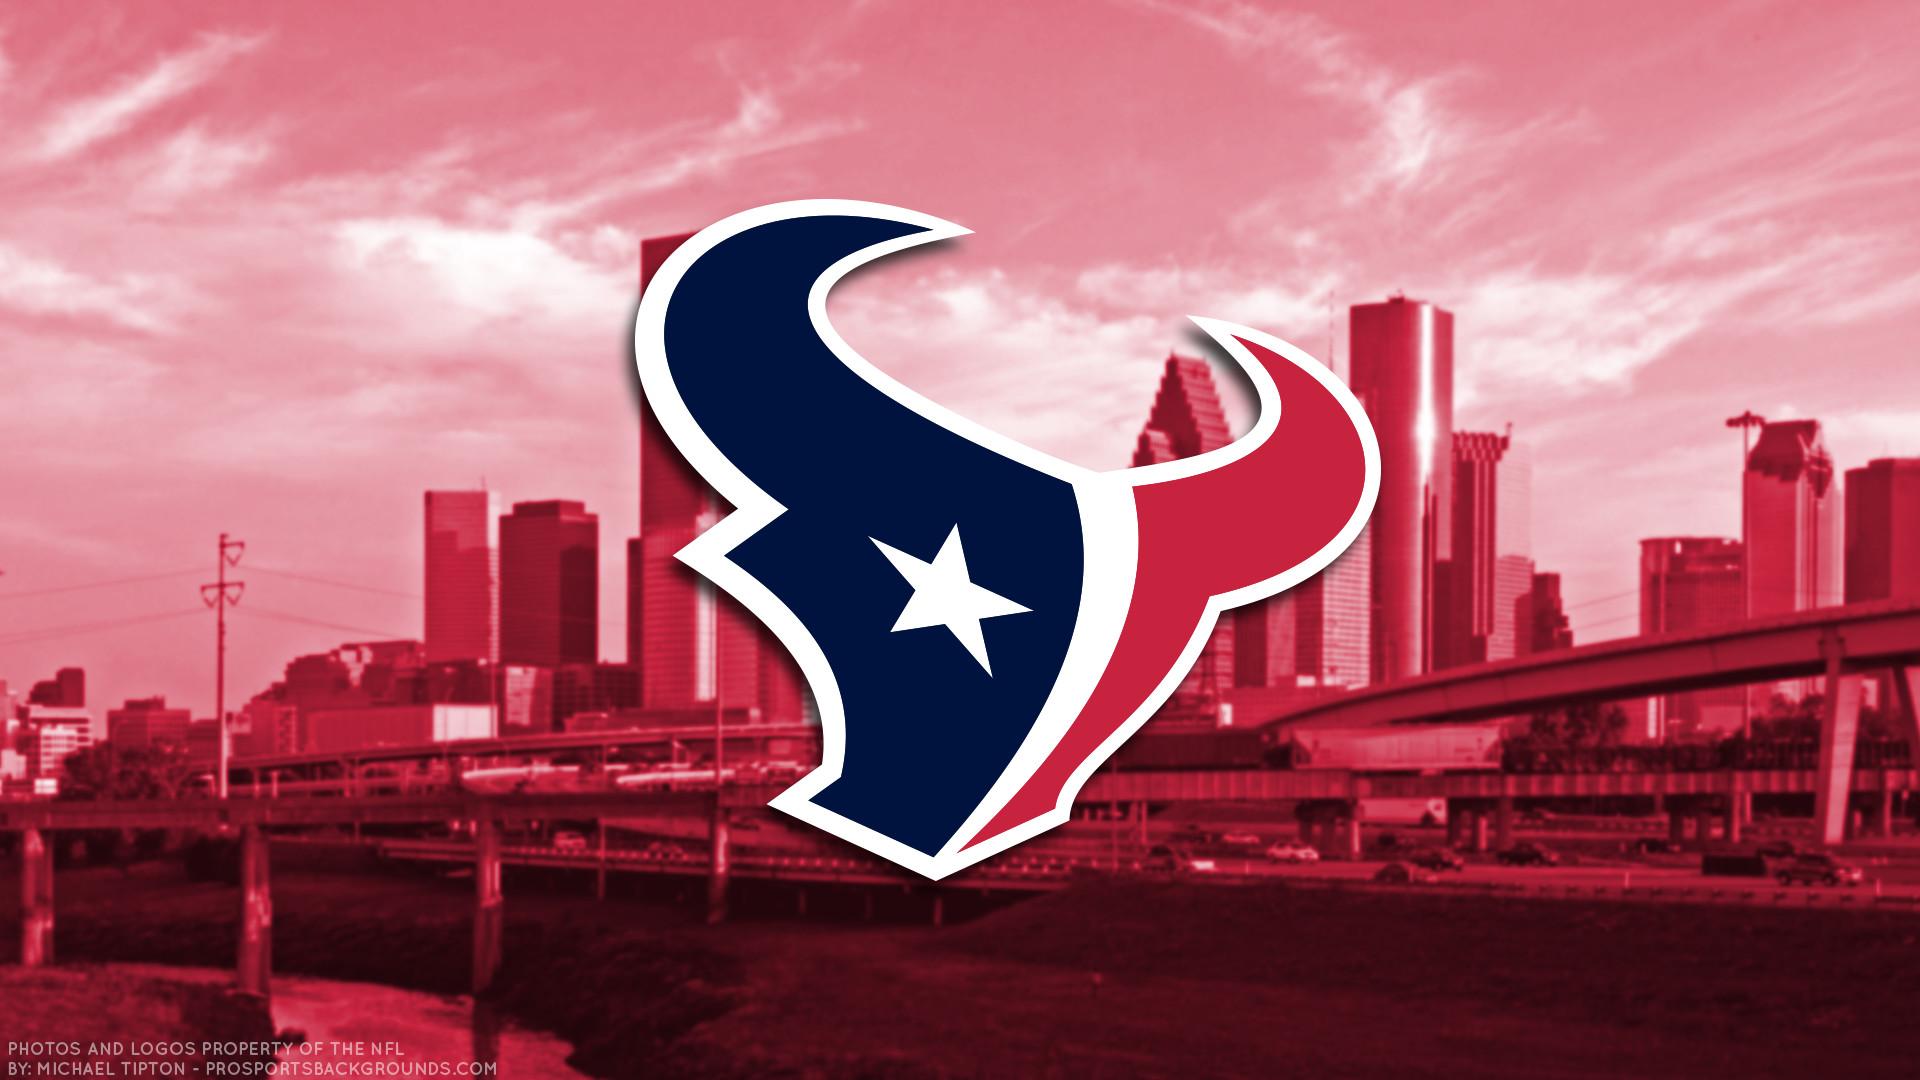 Houston Texans Screensavers and